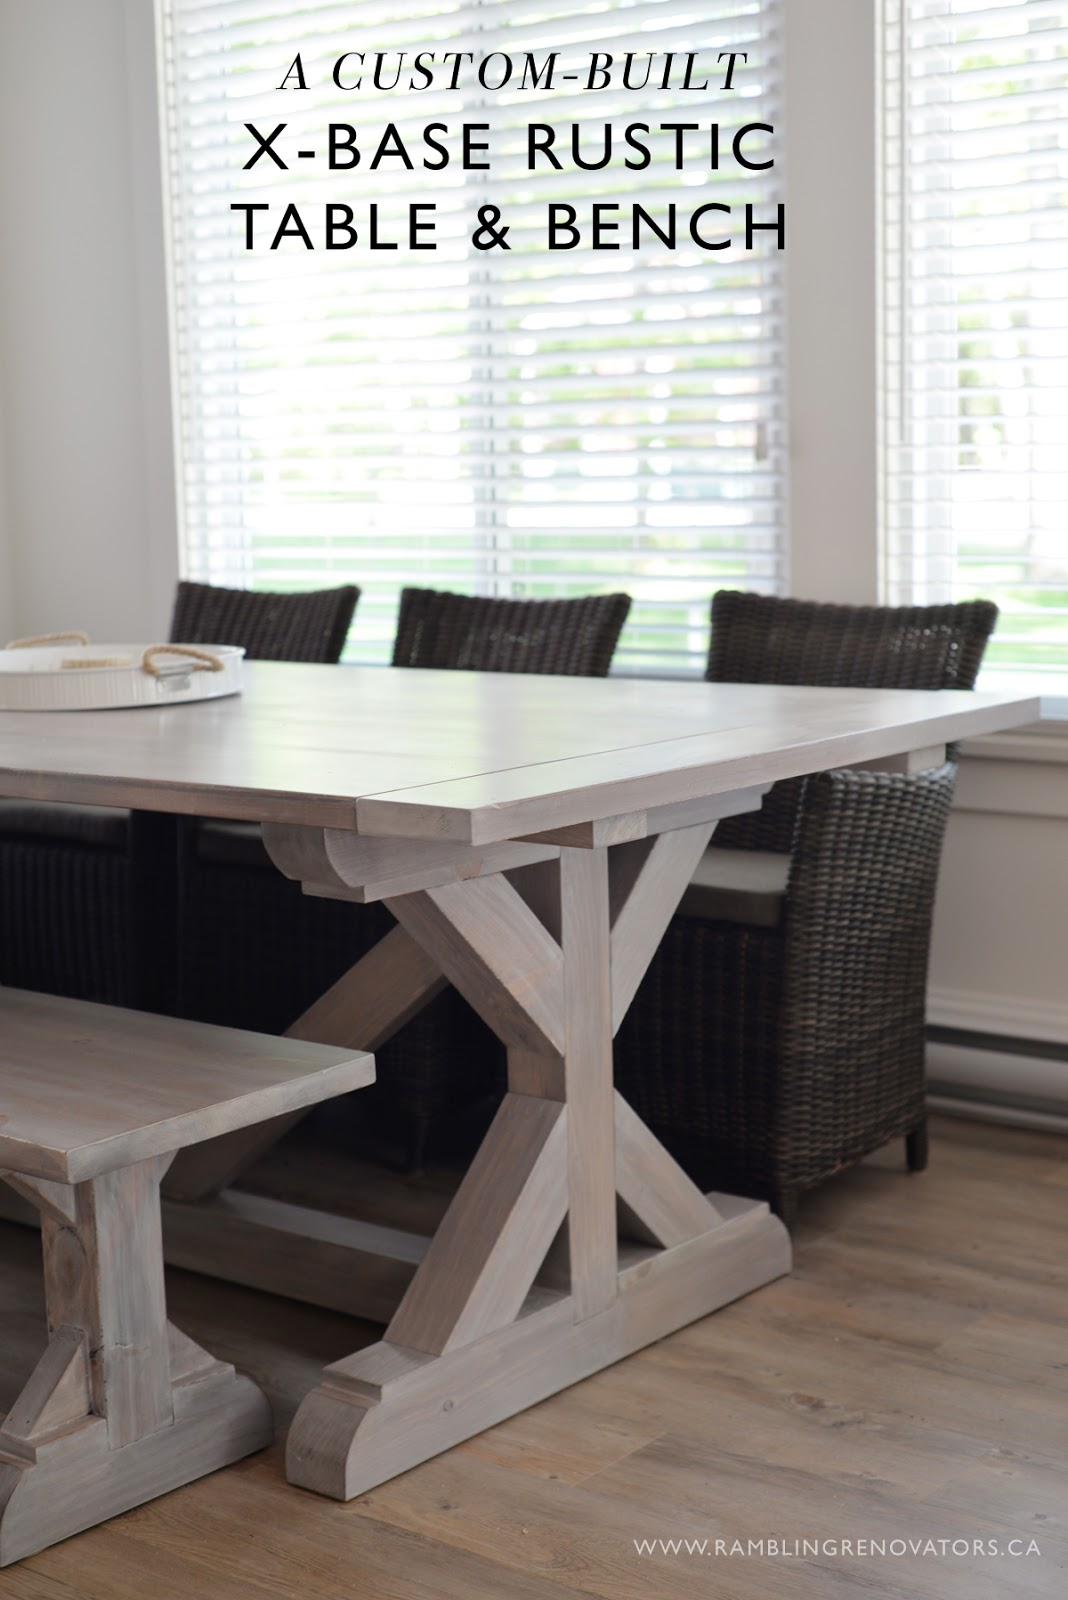 Best Ramblingrenovators ca custom handmade rustic x base farmhouse table with beachy stain finish